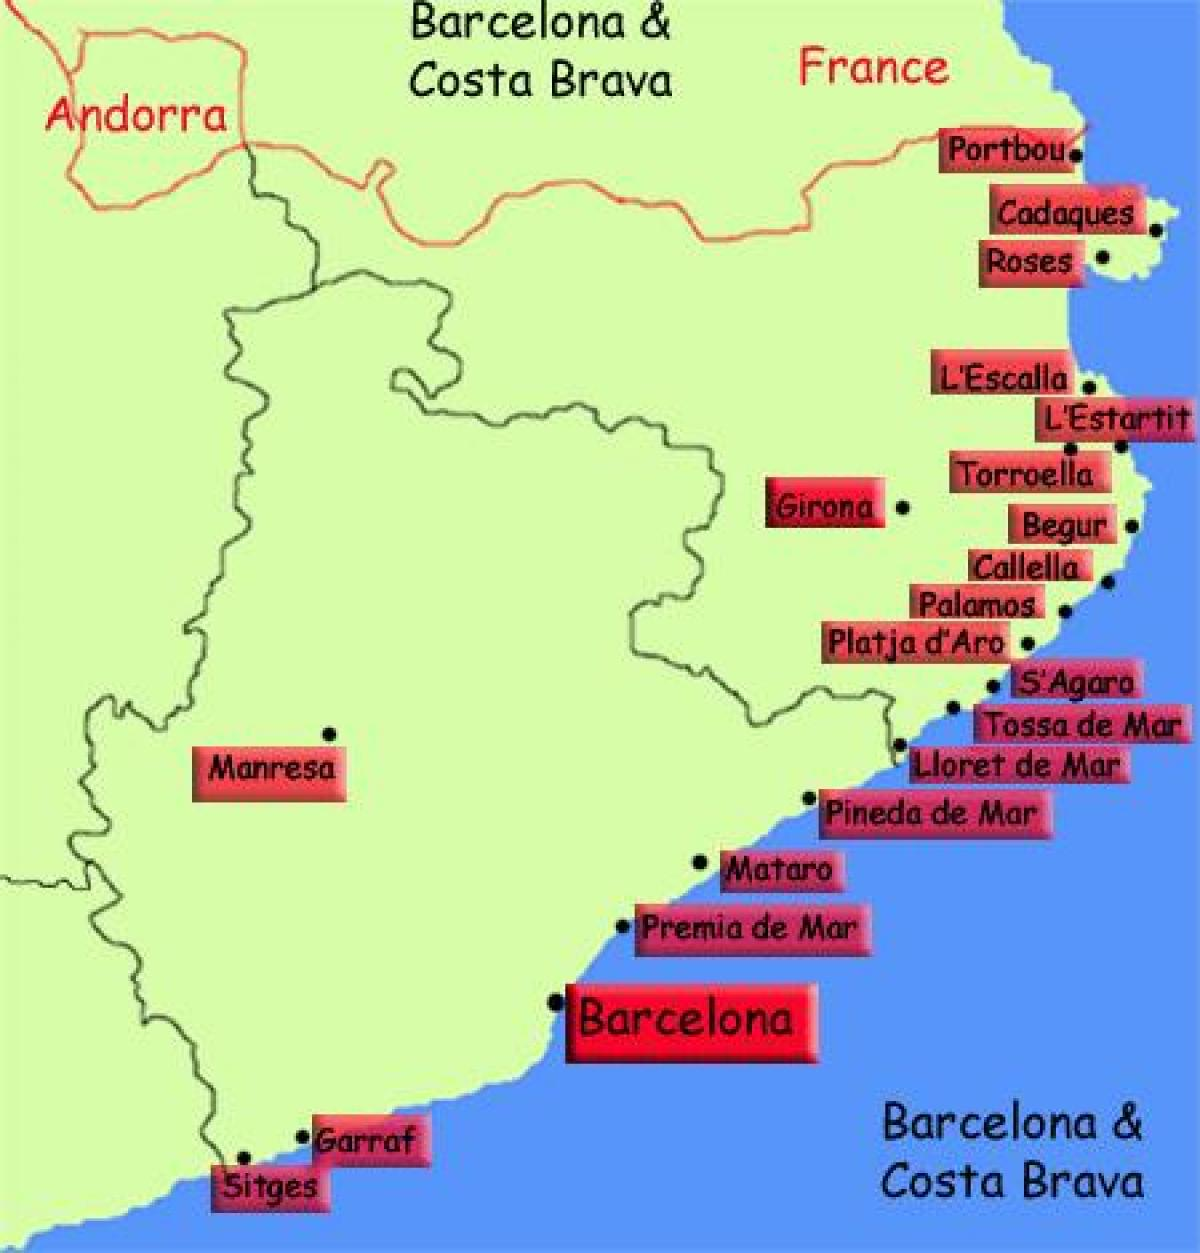 Kartta Barcelonan Rannikko Kartta Kartta Barcelonan Rannikko